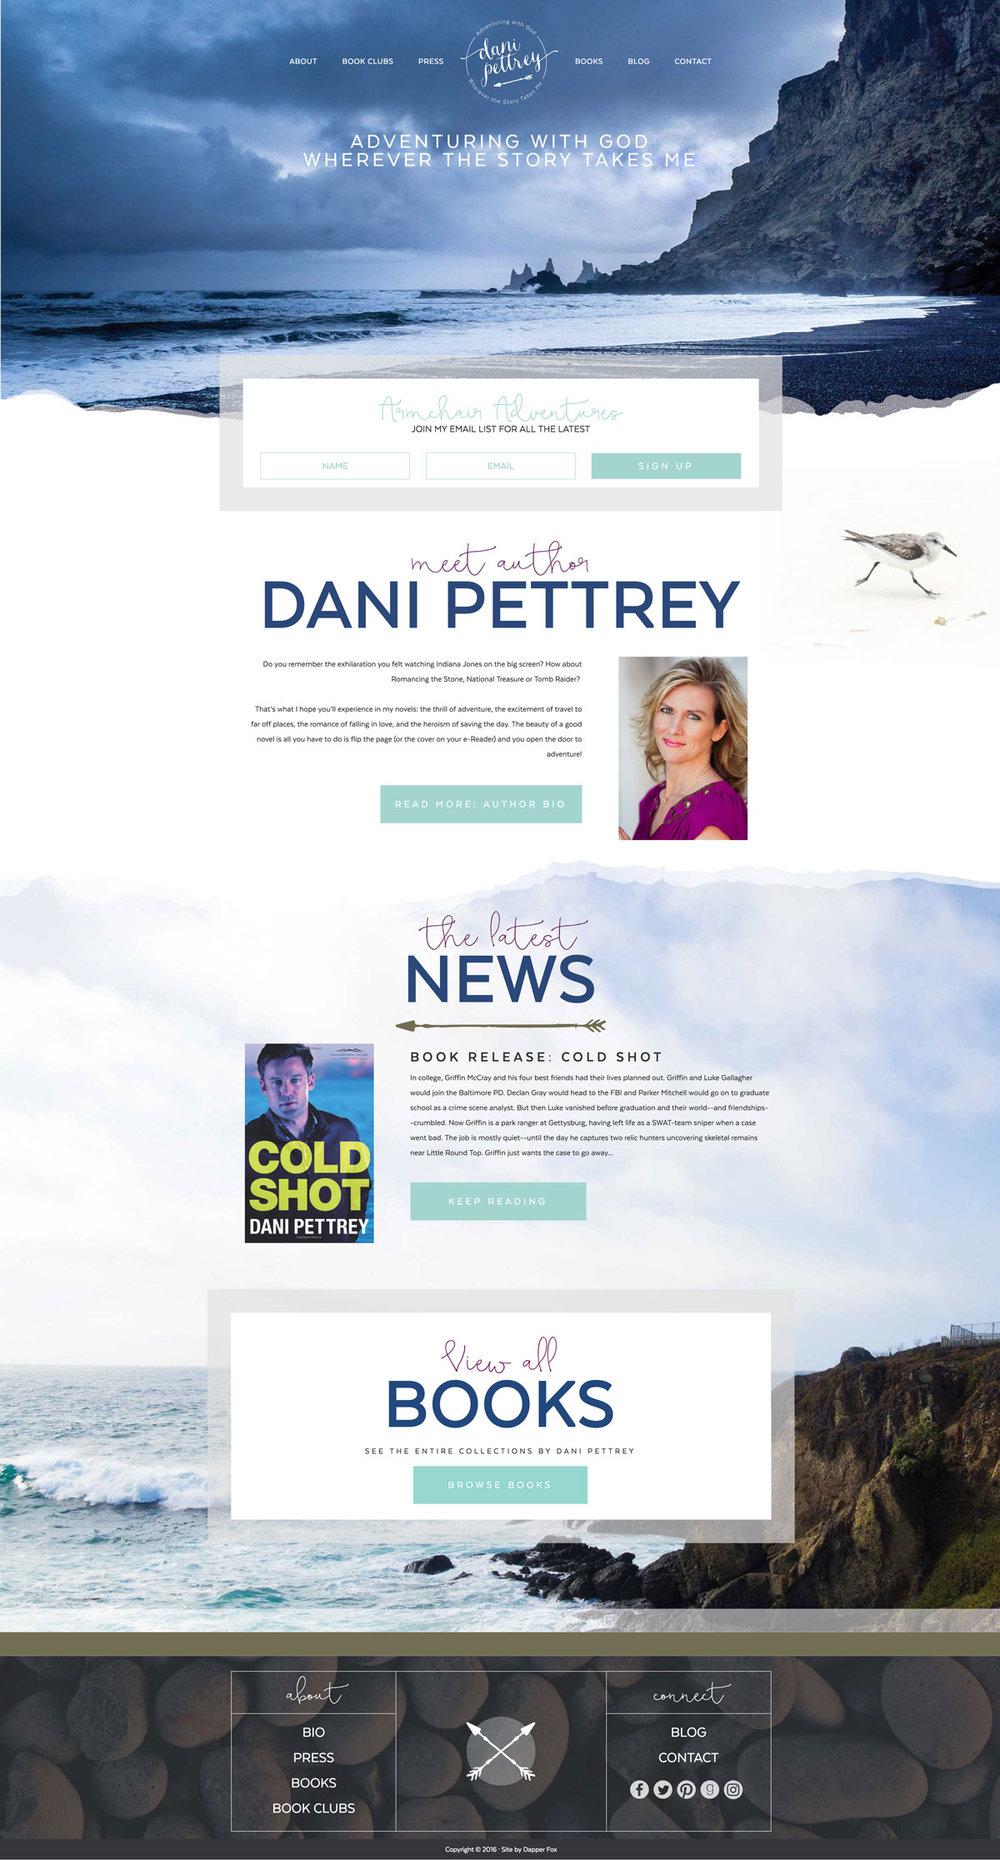 Dani Pettrey Wordpress Website and Branding Design #Coastal #Beach #Ocean #Design #Modern